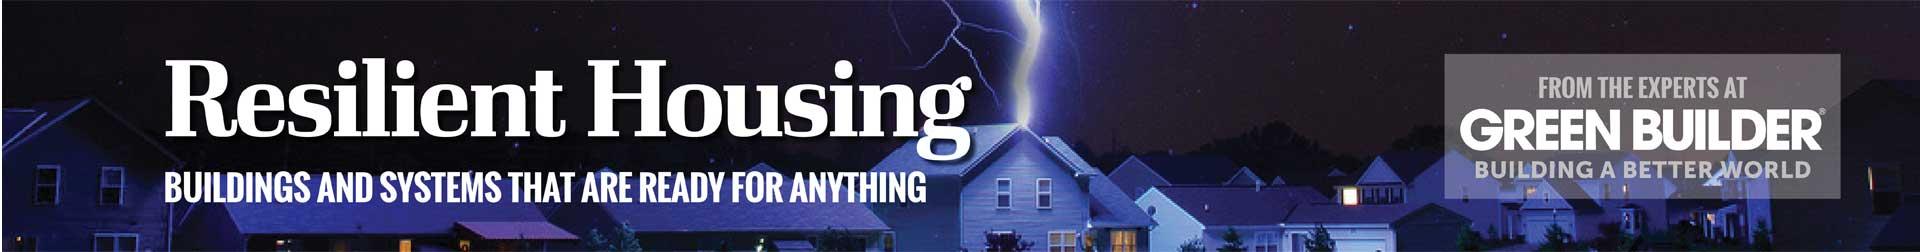 Resilient Housing Green Builder Banner